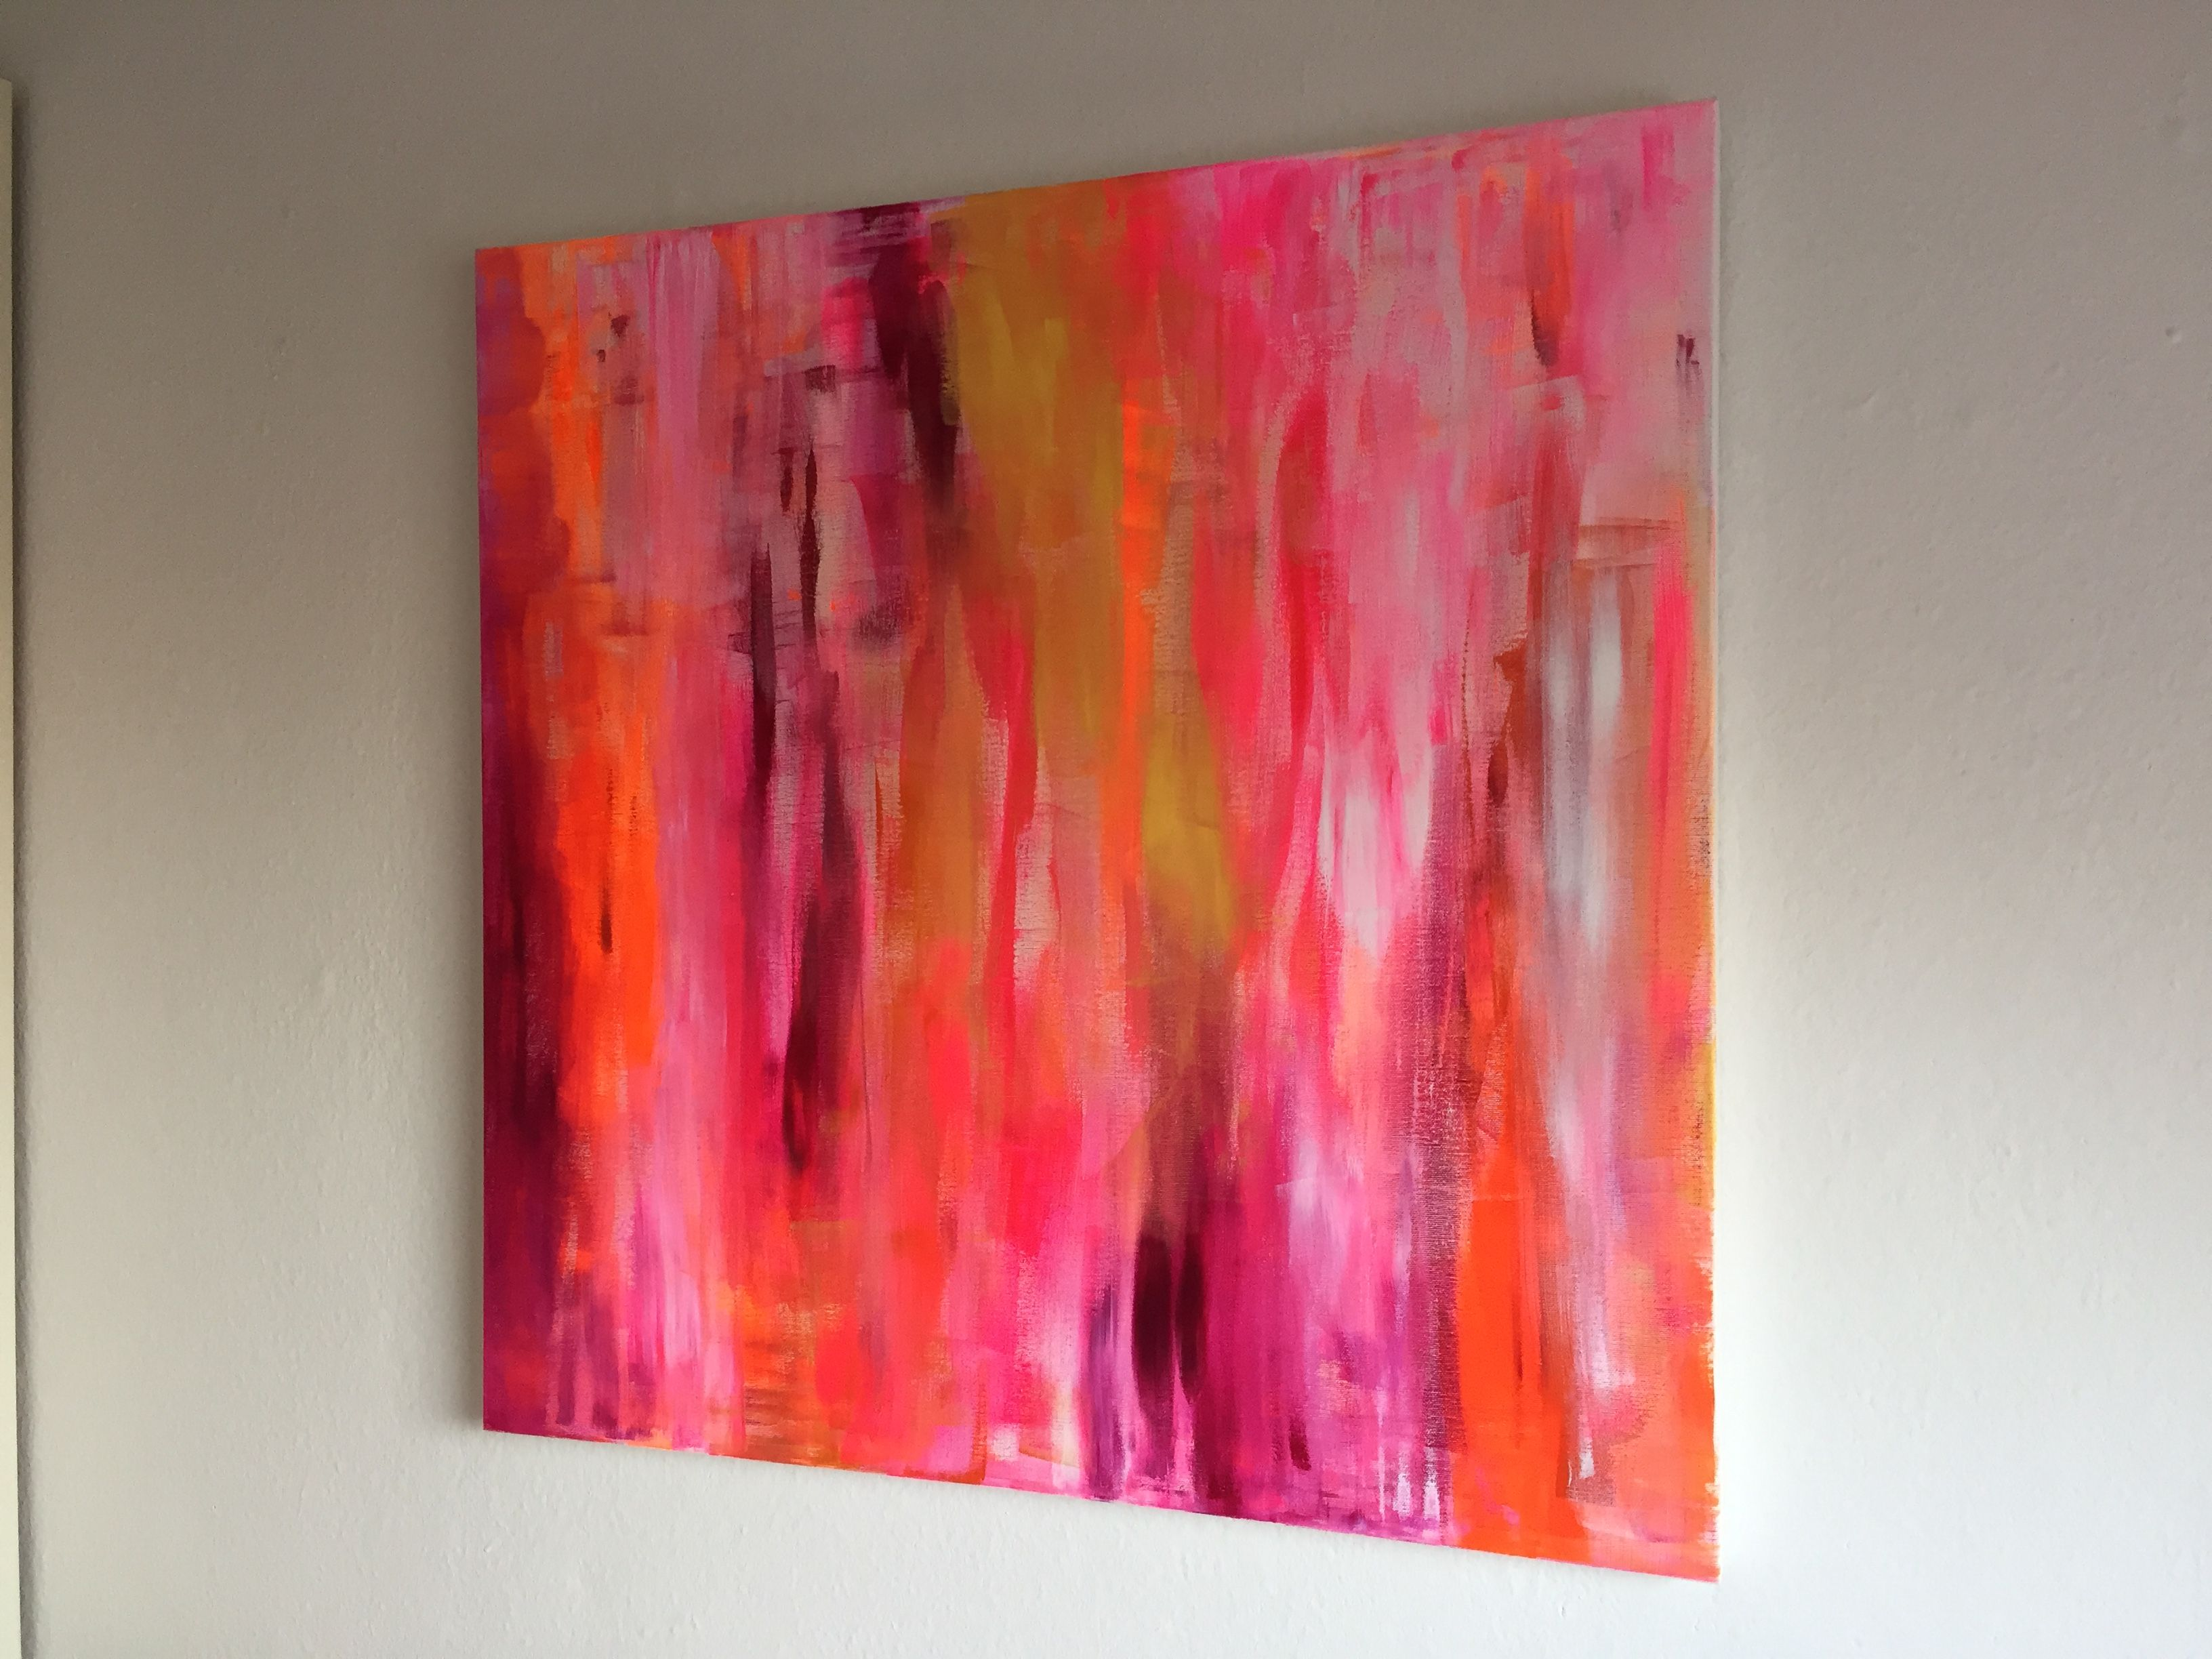 acryl auf leinwand 80x80 abstractart lebensfreude loveart neon abstrakte malerei abstrakt große bilder poster günstig